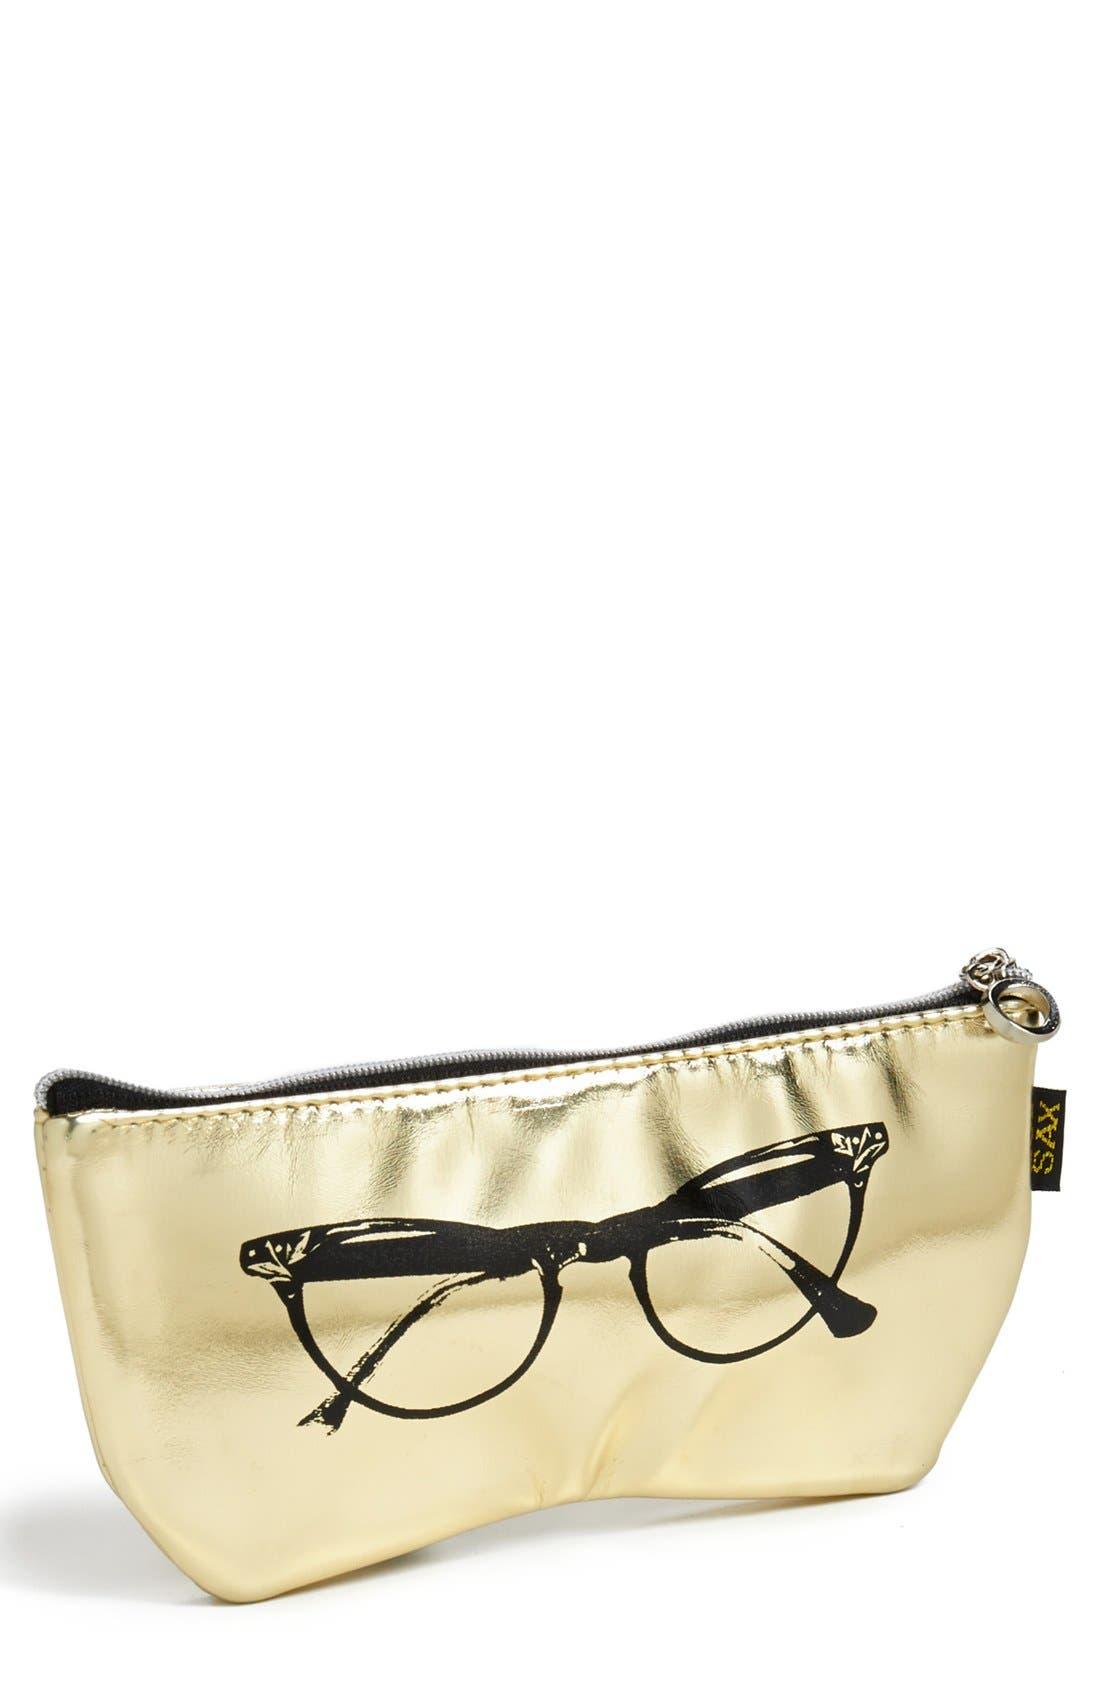 Main Image - Sax Eyewear Accessory Eyeglasses Pouch